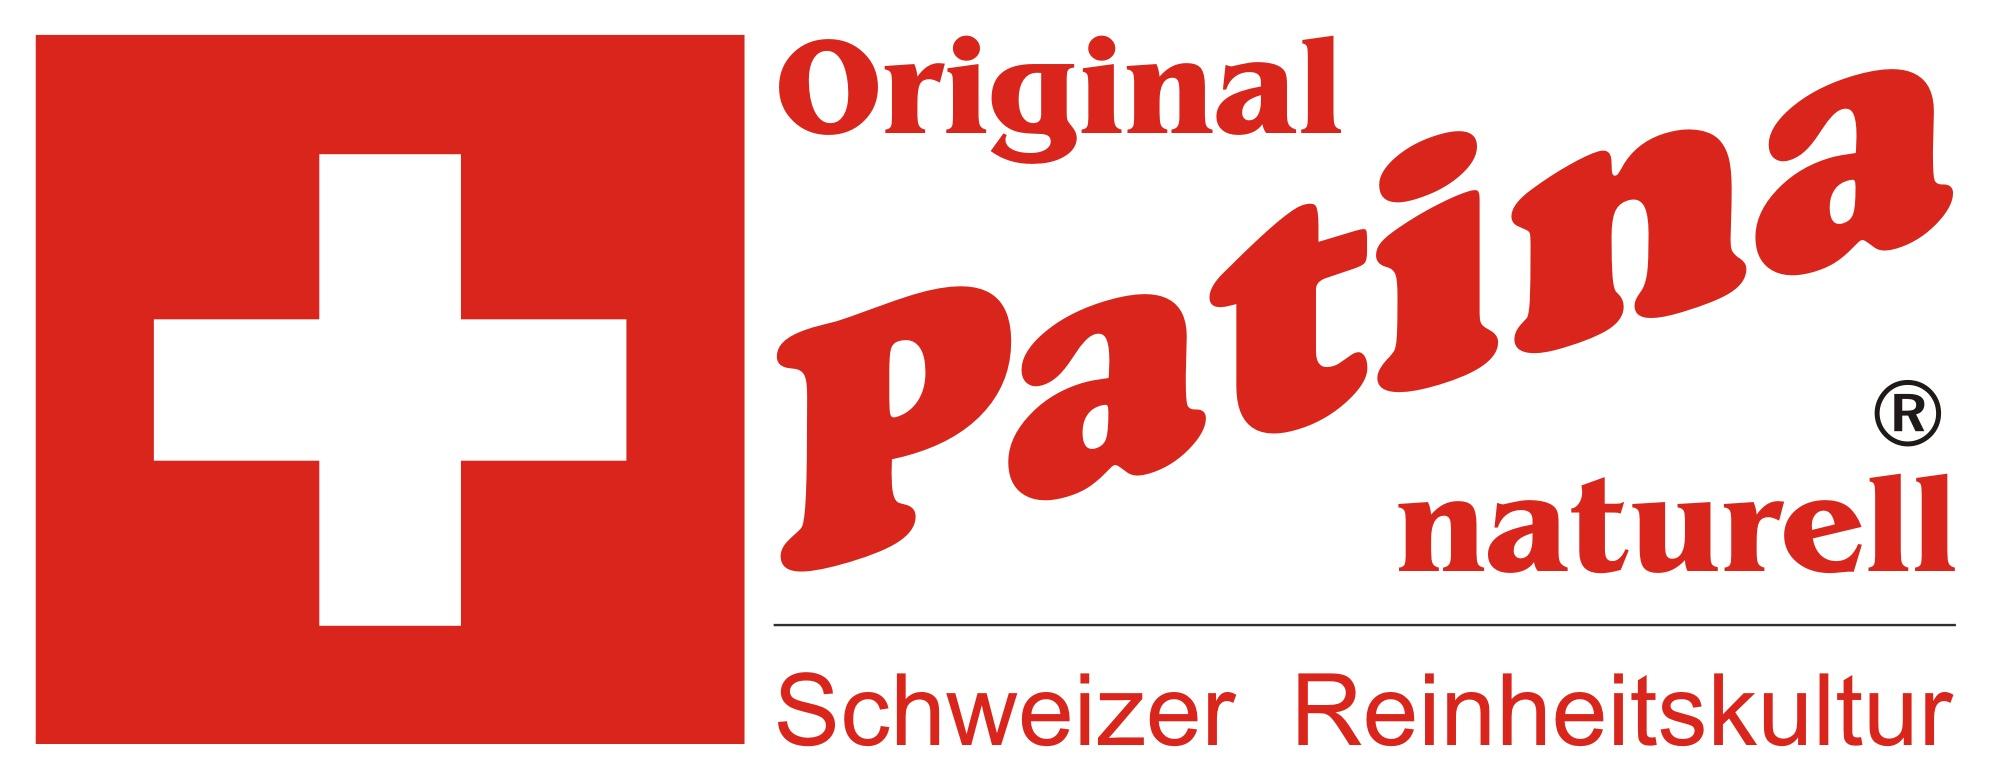 Patina-Naturell - Schweizer Reinheitskultur-Logo